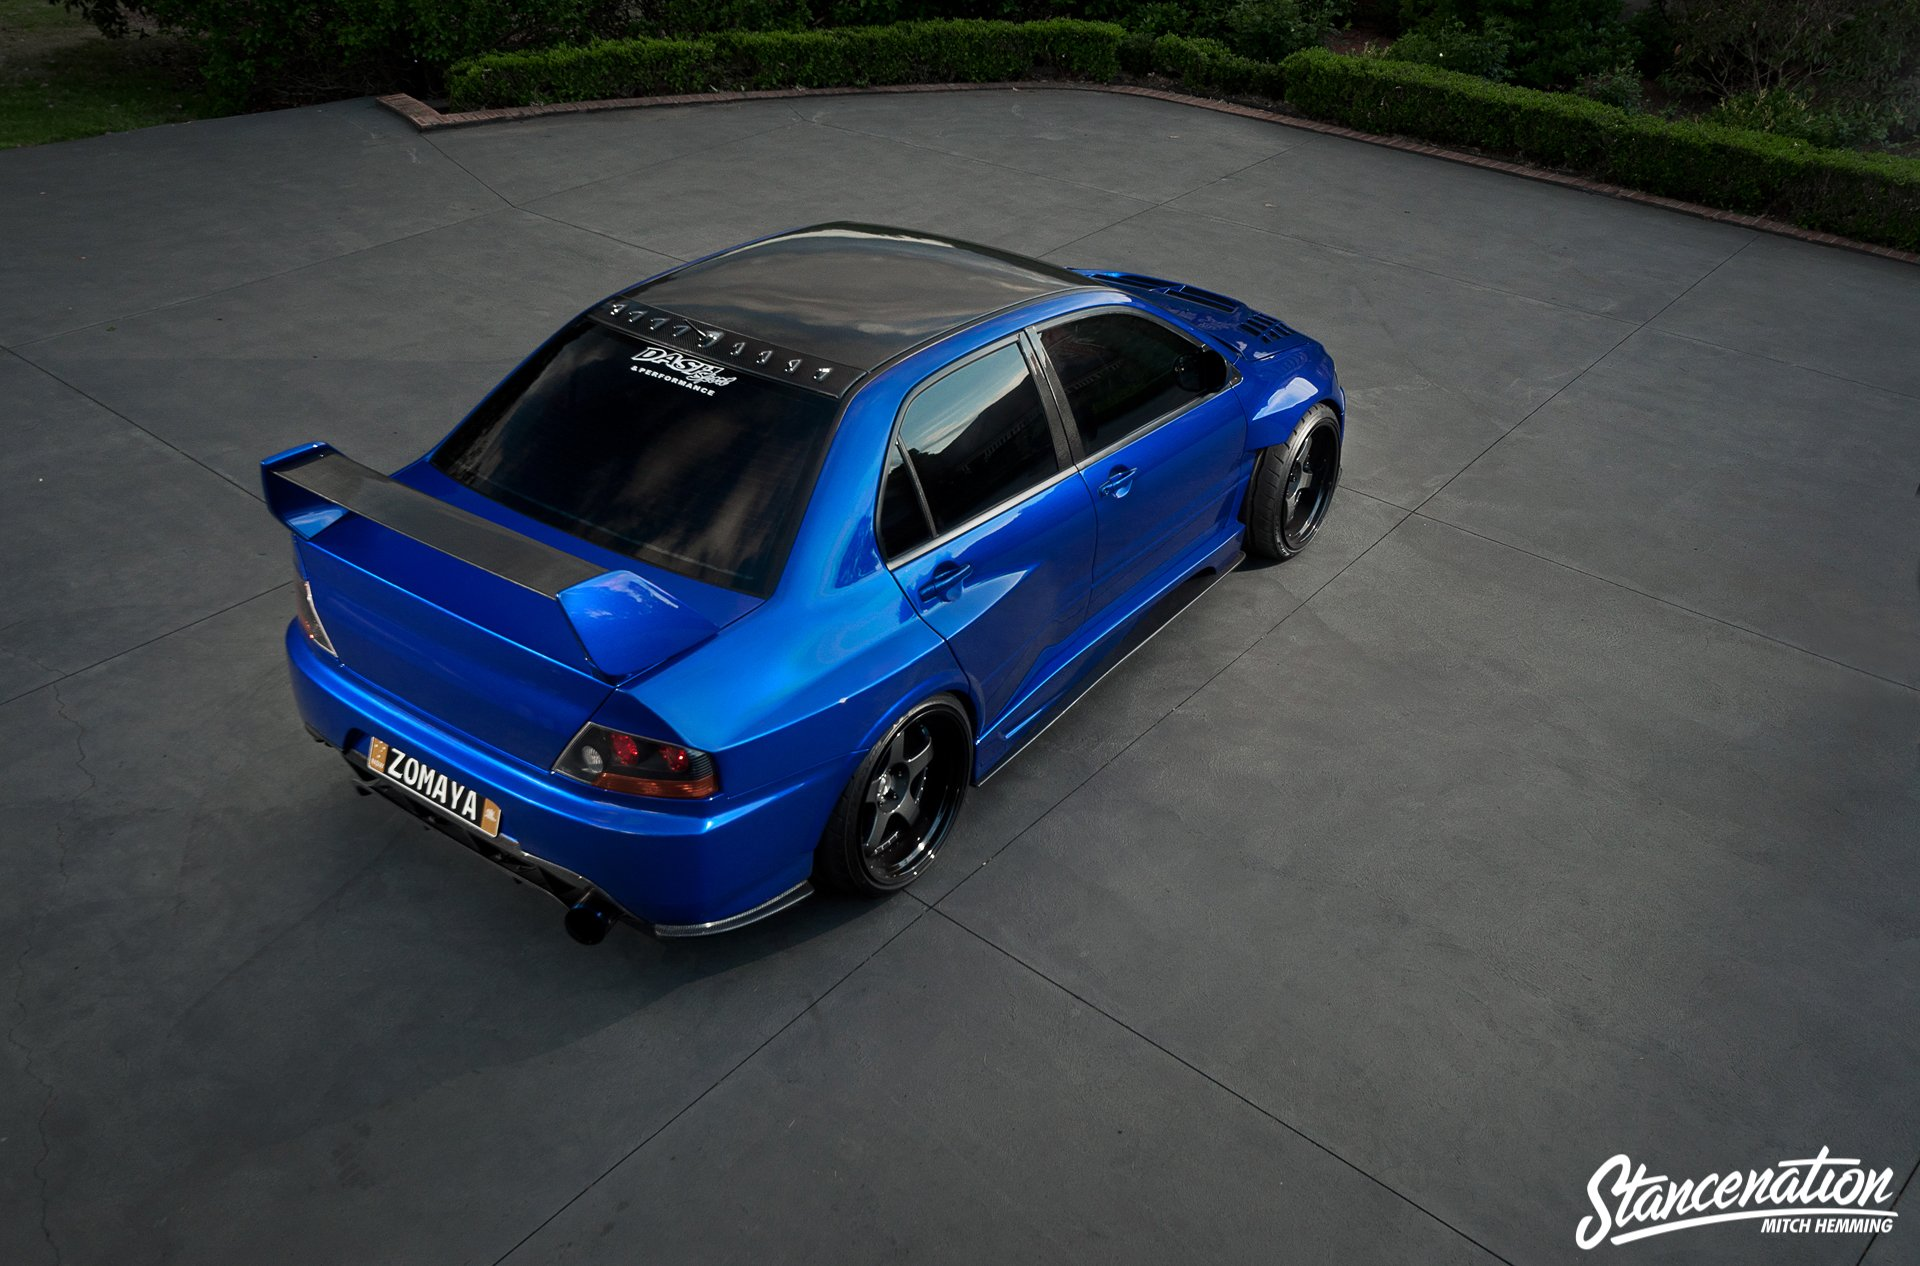 mitsubishi lancer evo ix blue cars sedan modified wallpaper 1920x1266 812916 wallpaperup - Mitsubishi Evo 9 Blue